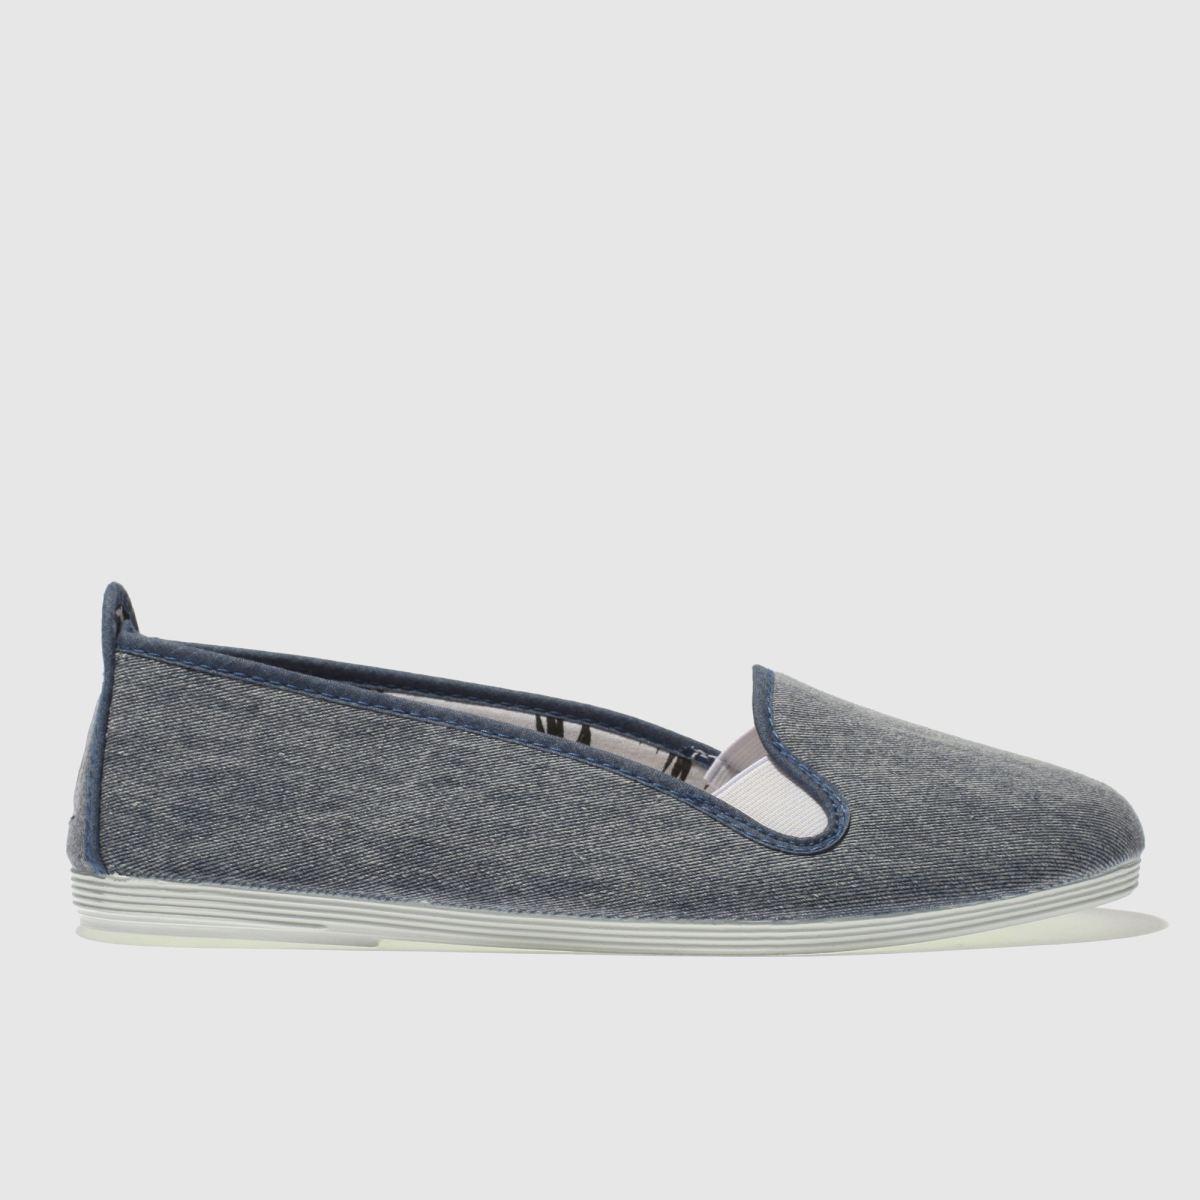 Flossy Flossy Blue Mijas Flat Shoes